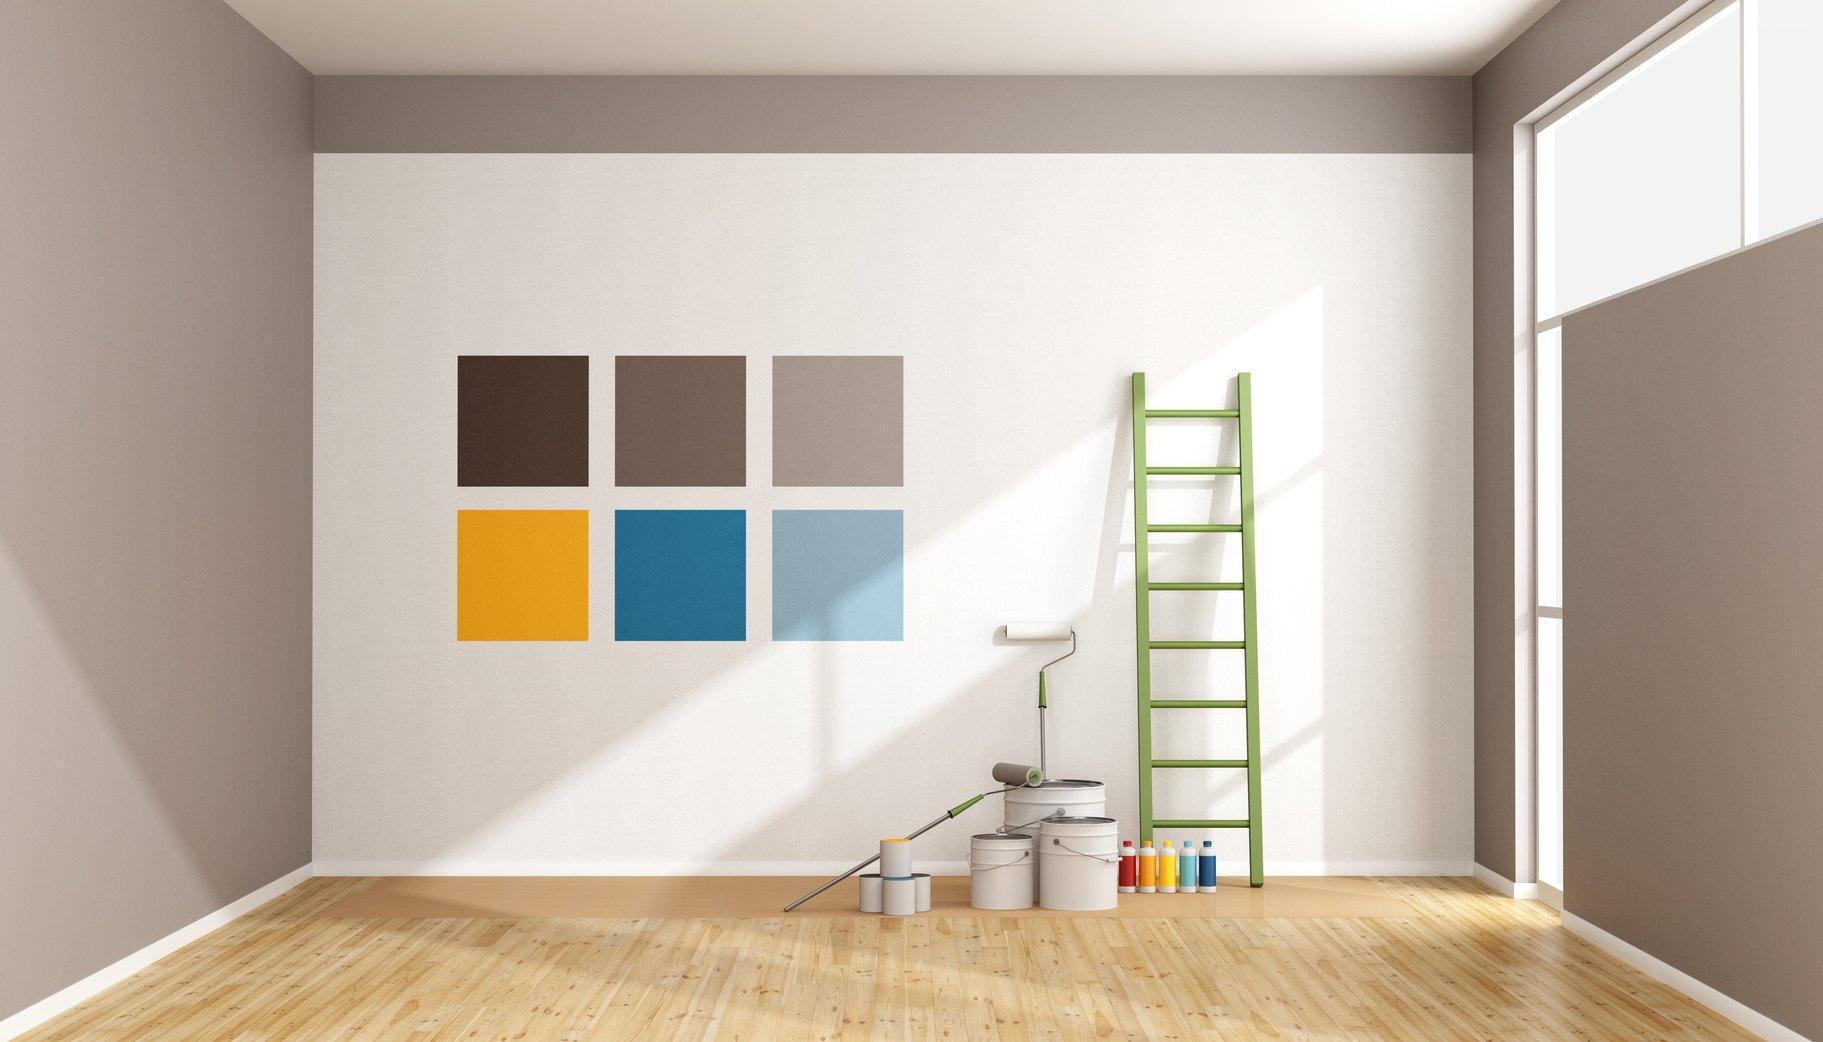 Bien choisir sa peinture intérieure